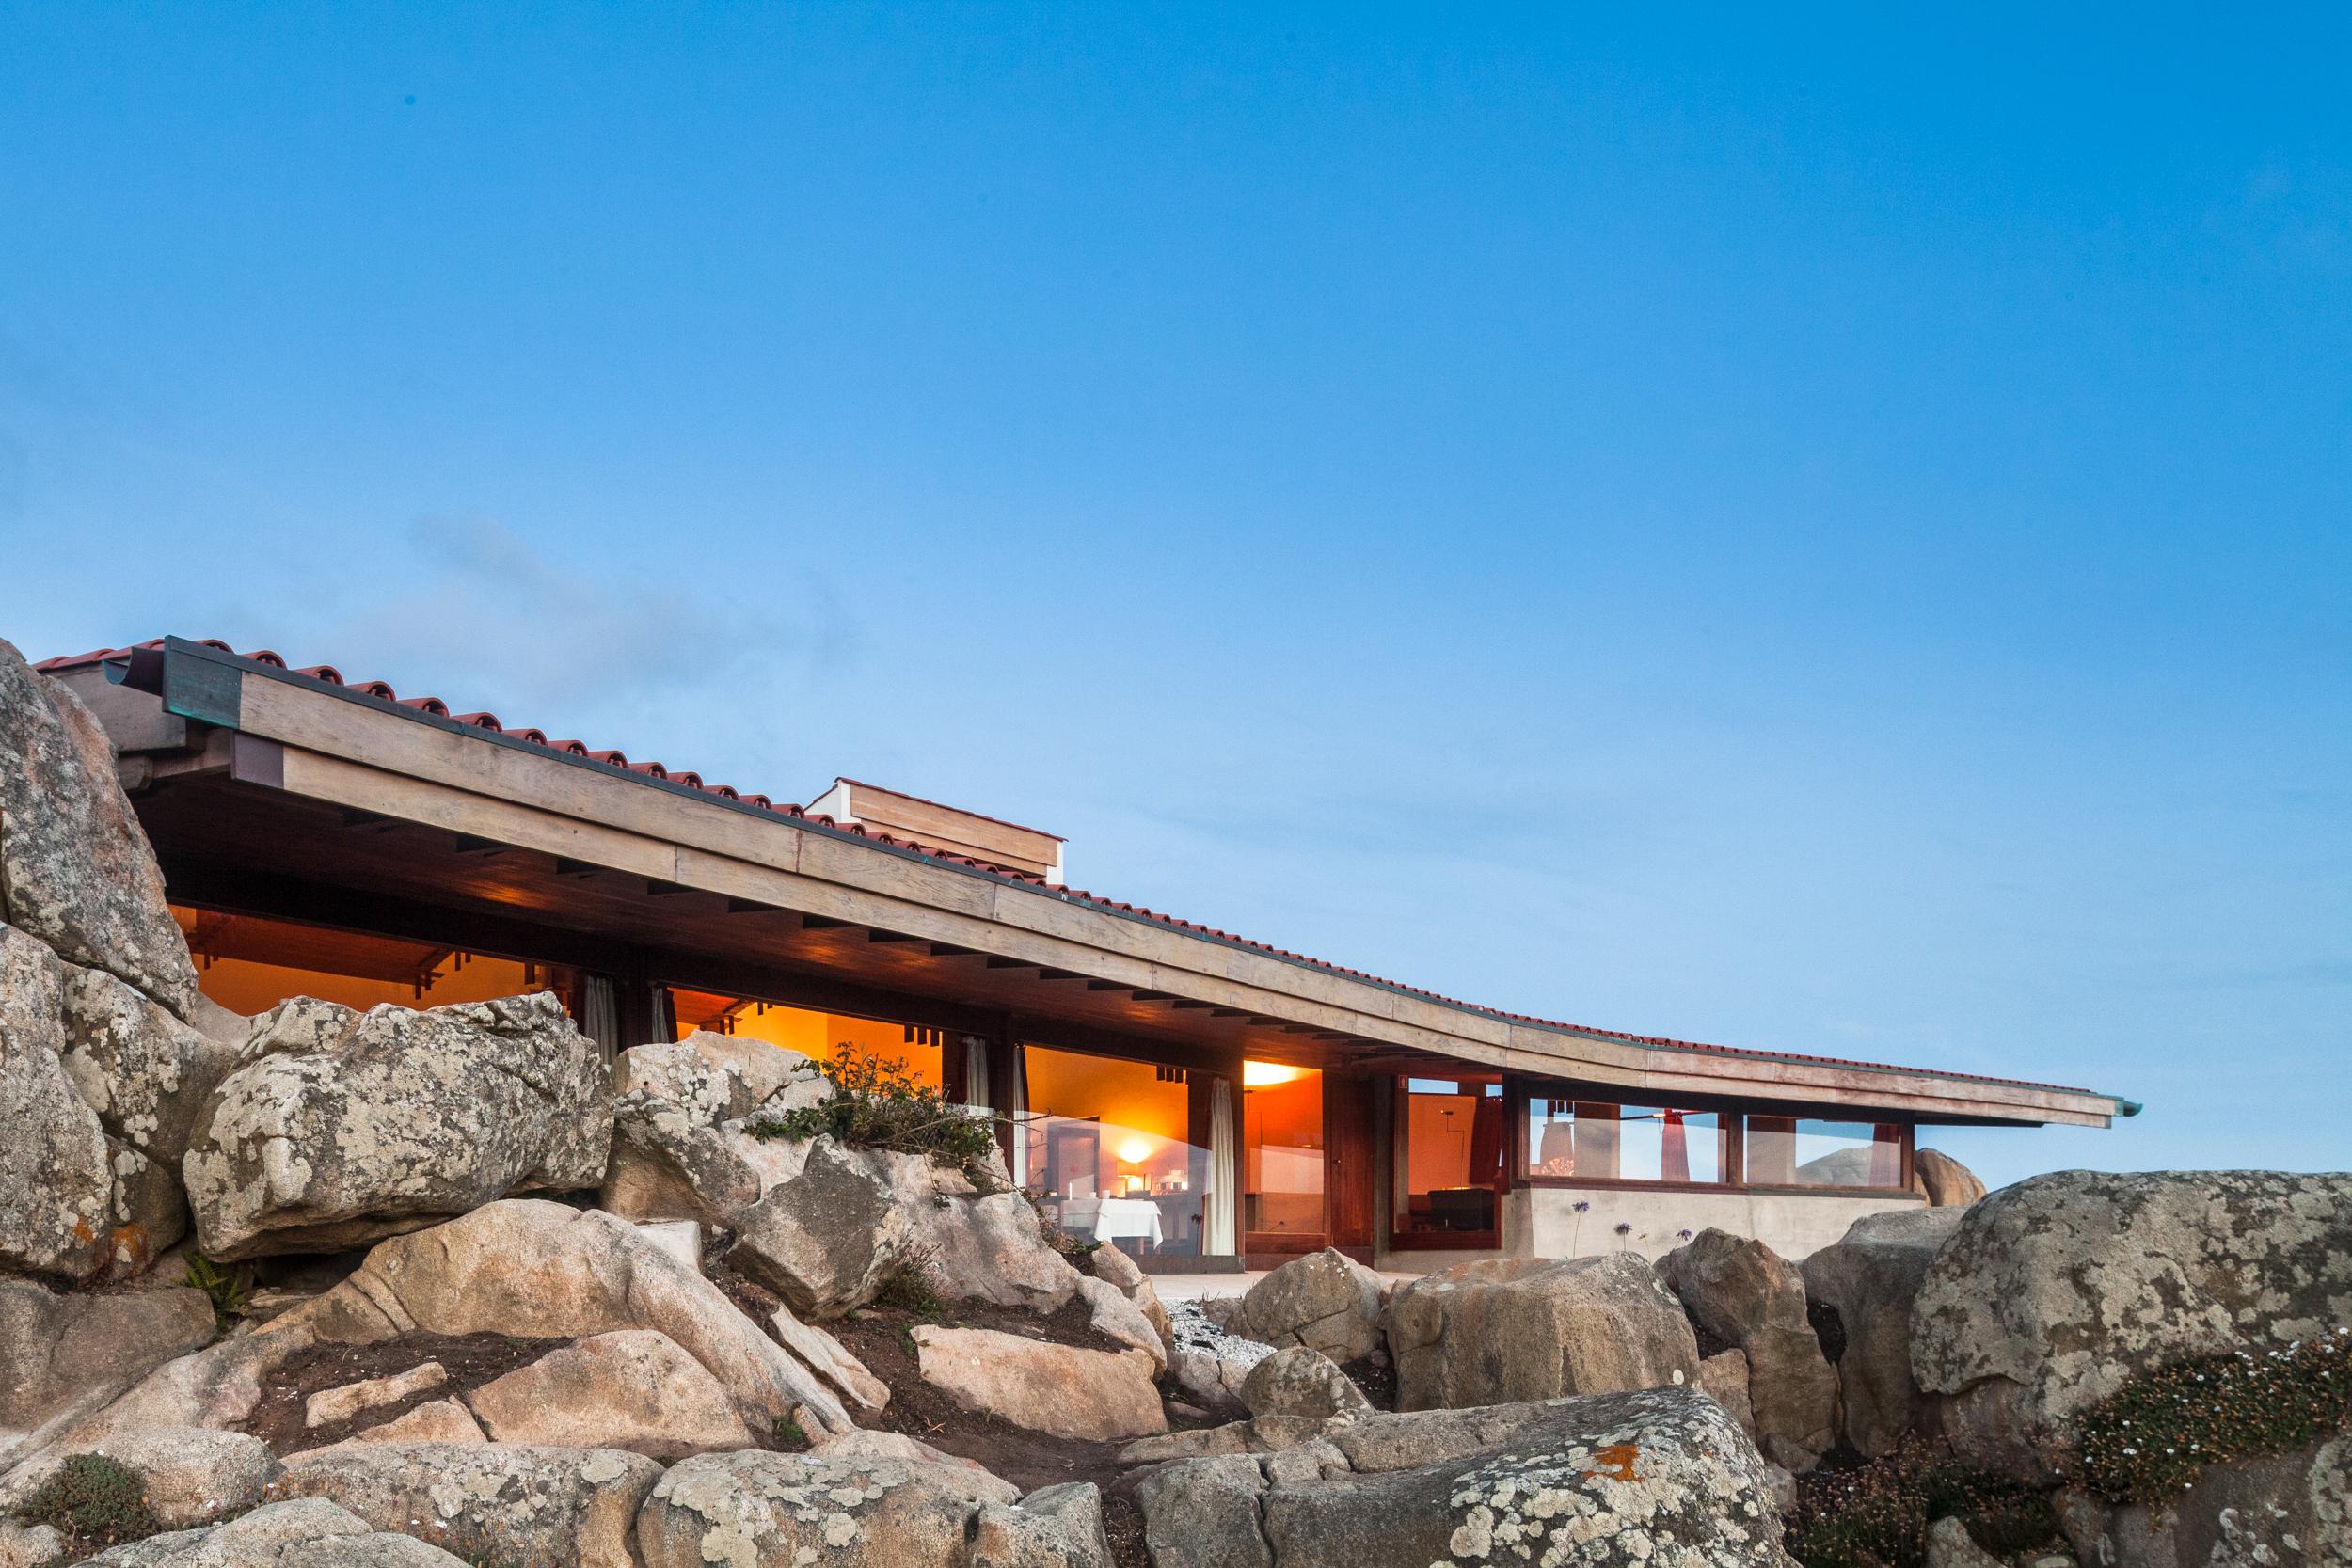 Best Restaurants in Northern Portugal restaurants Best Restaurants from Northern Portugal Boa Nova Tea House Renovation